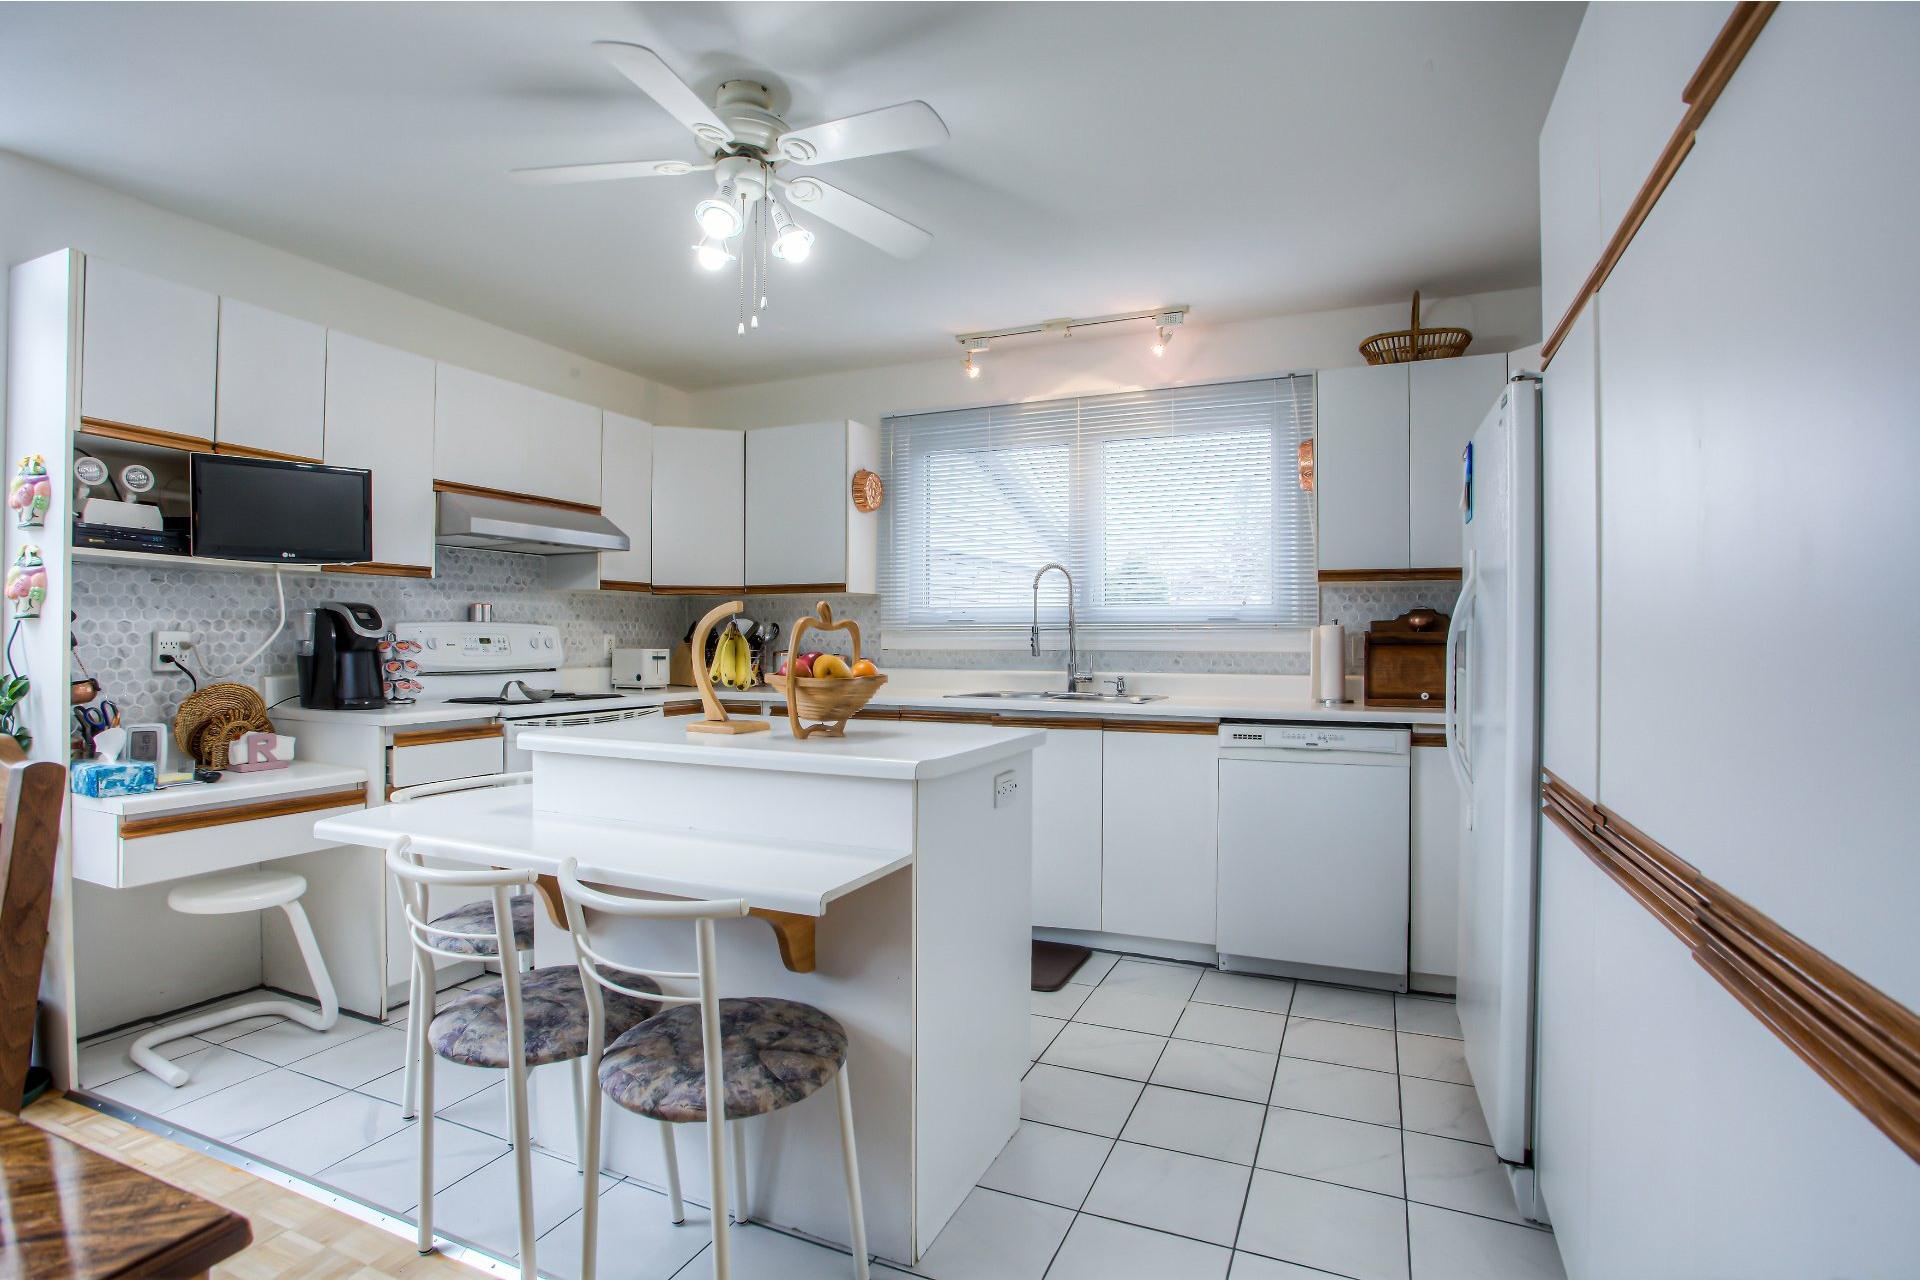 image 8 - MX - Casa sola - MX En venta Dollard-Des Ormeaux - 11 habitaciones